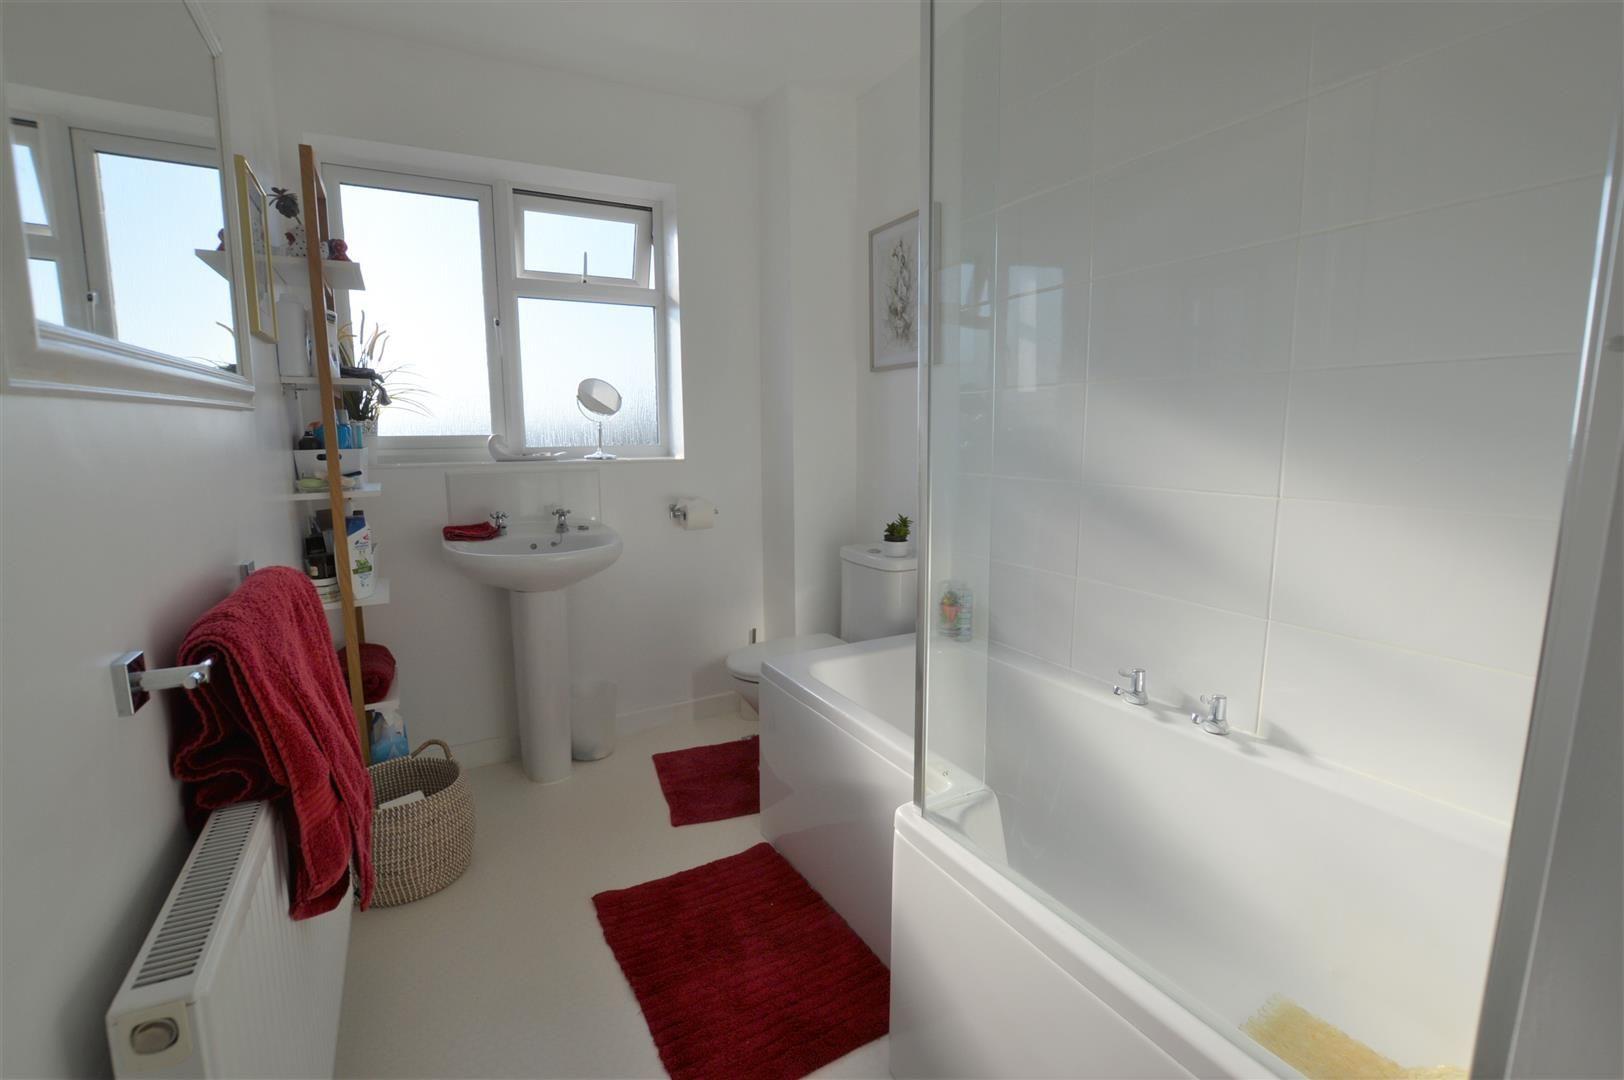 4 bed semi-detached for sale in Bromyard  - Property Image 8